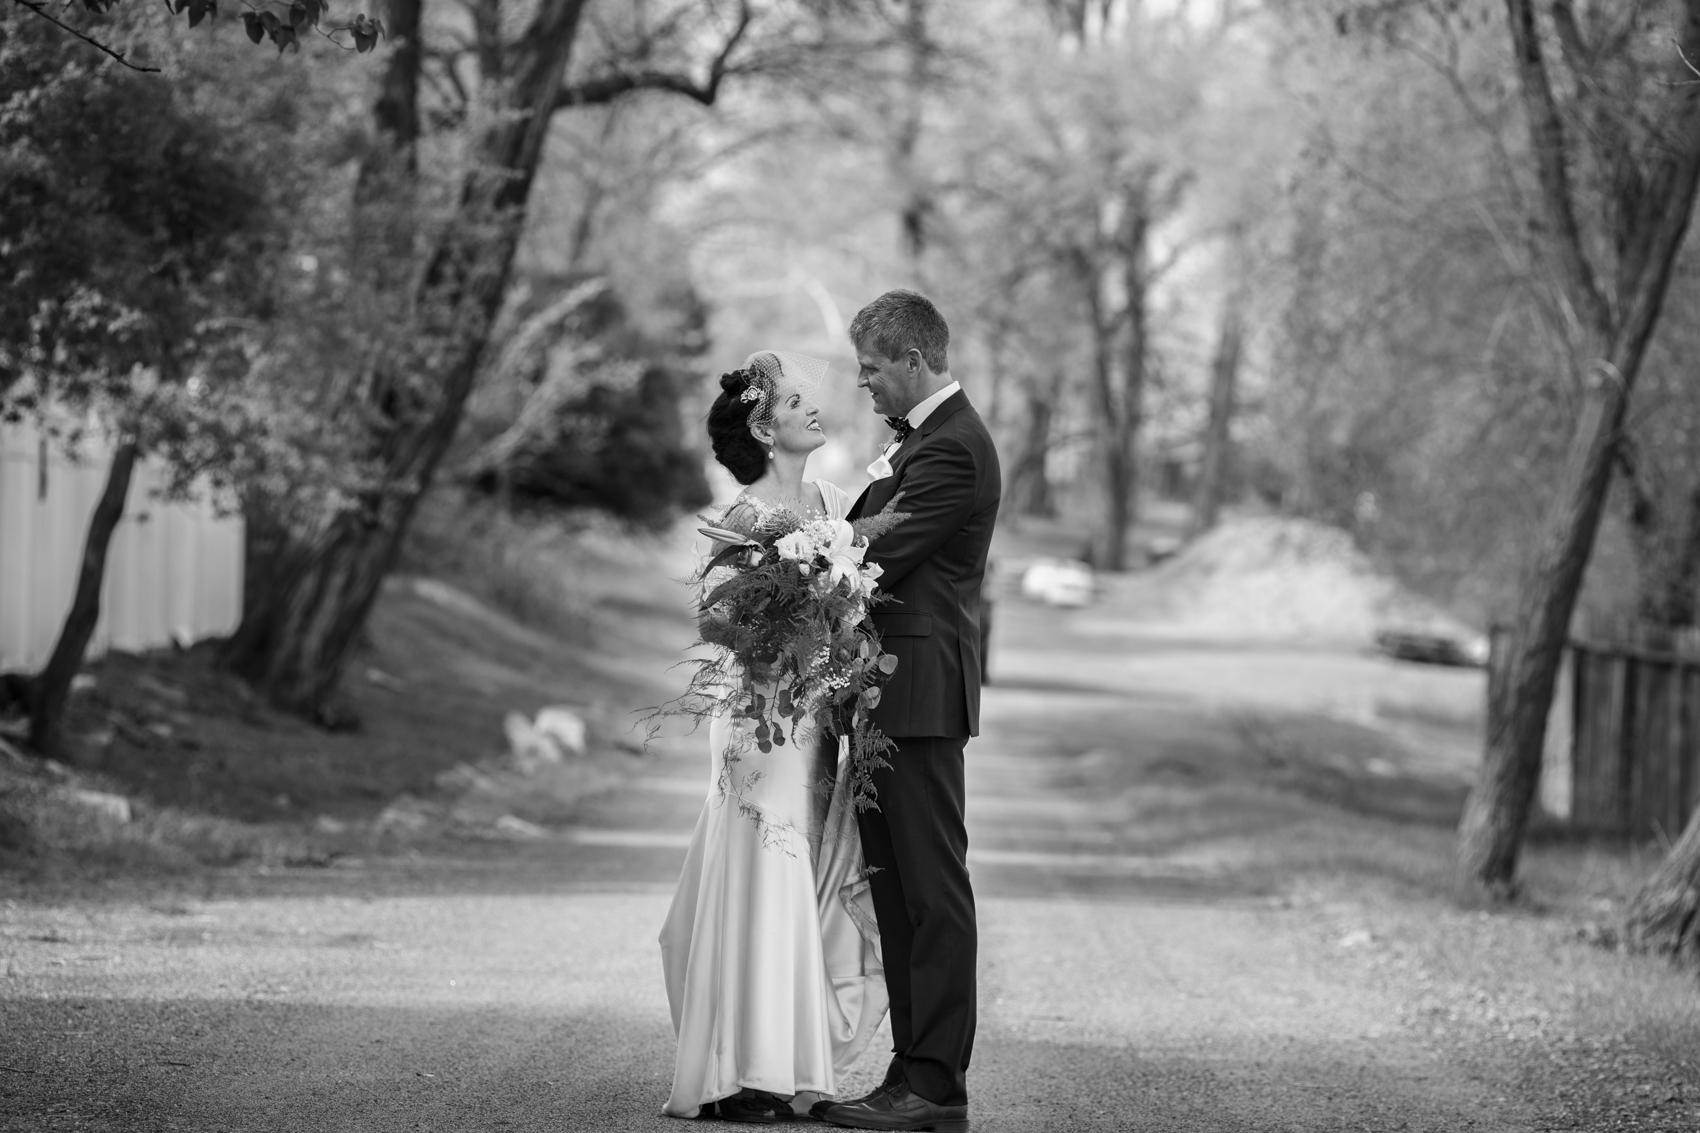 Maite Iribarren-Gorrindo of Ahizpak marries Mr. Mark van Gulik!